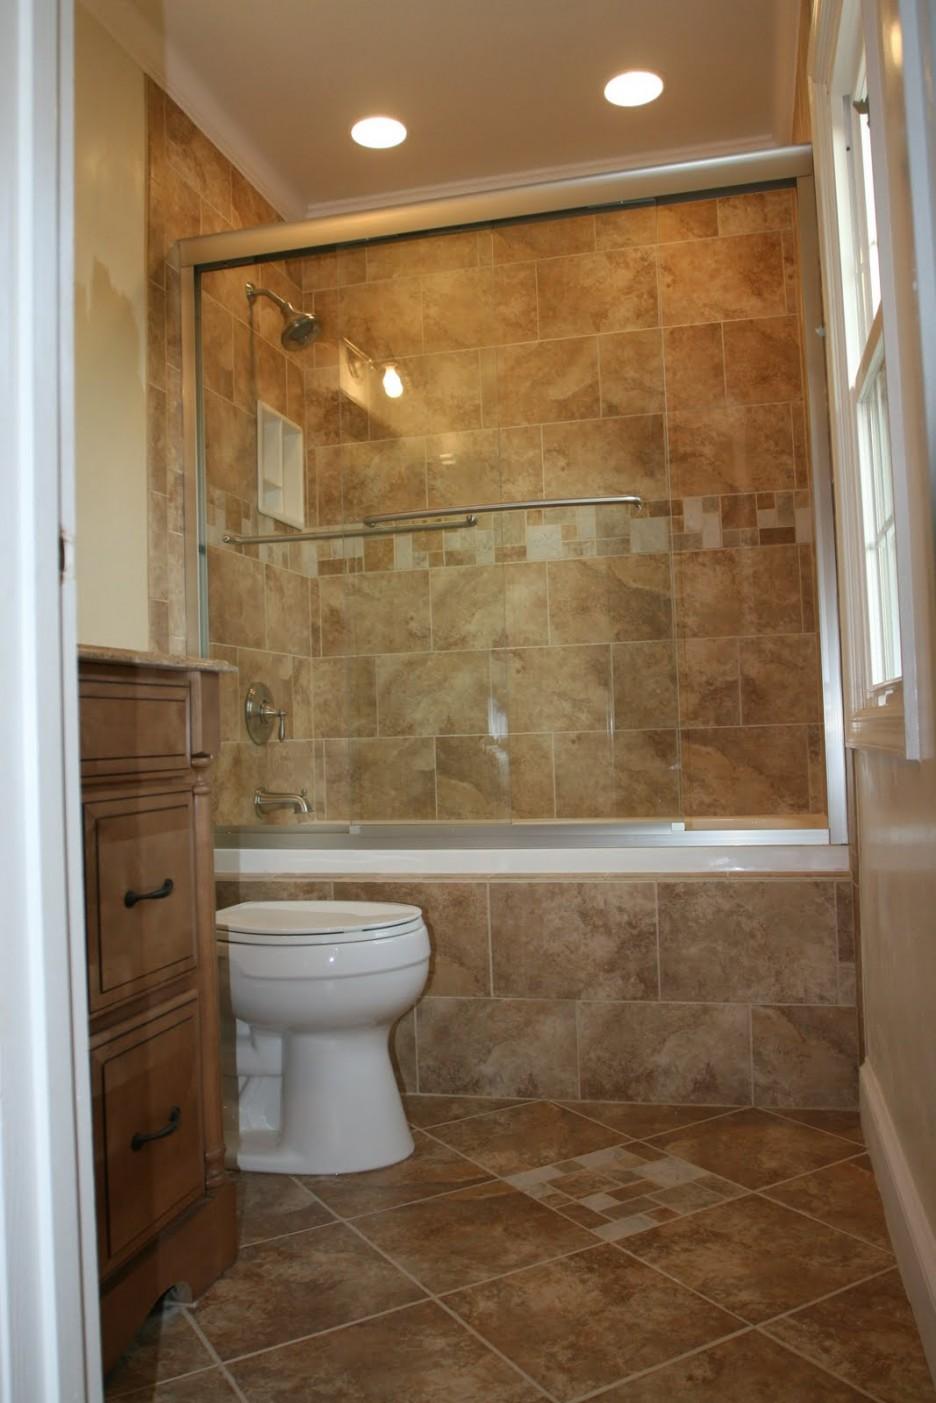 Bathroom Travertine Tile Designs. Bathroom Remodeling Pictures Home Bathroom Remodeling Pictures Including Shower Remodels Tub Remodels And Tile Remodels Small Bathrooms Are Ever